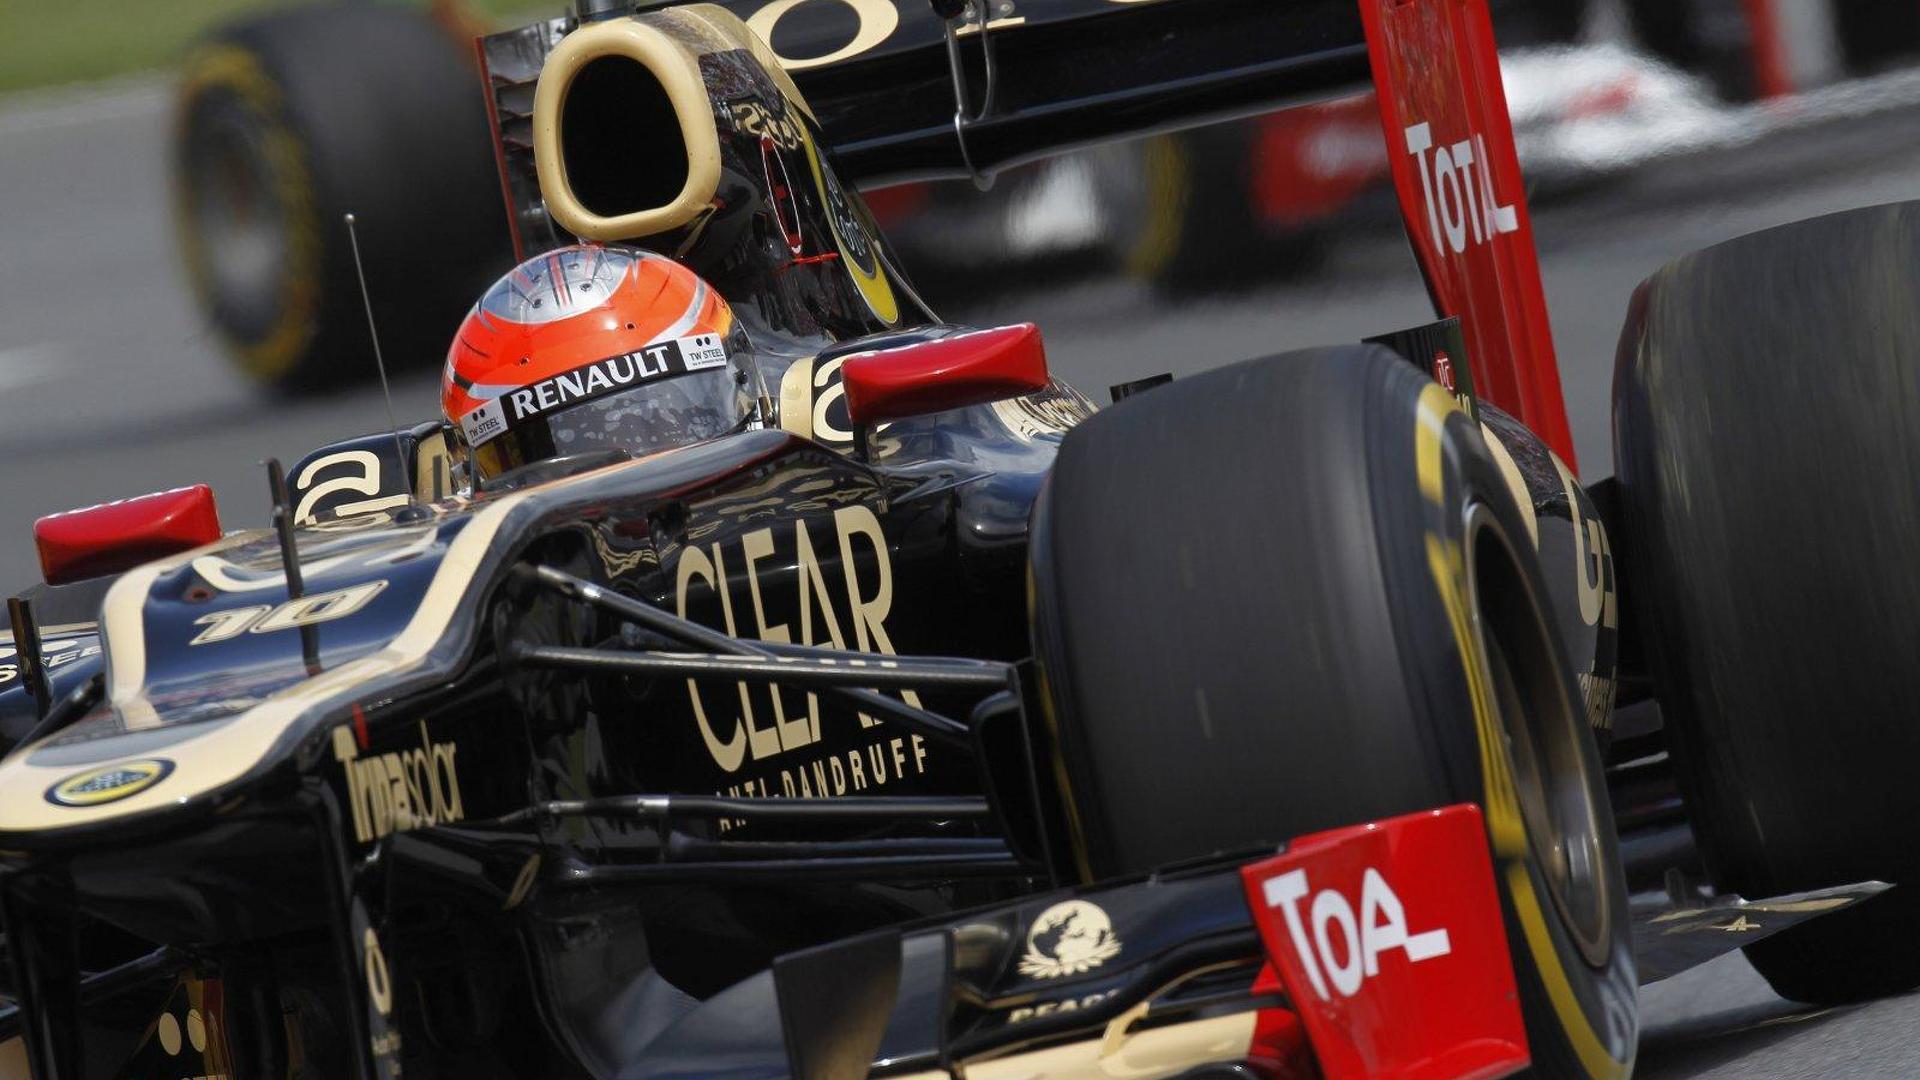 DRB-Hicom contemplating Lotus F1 team sale